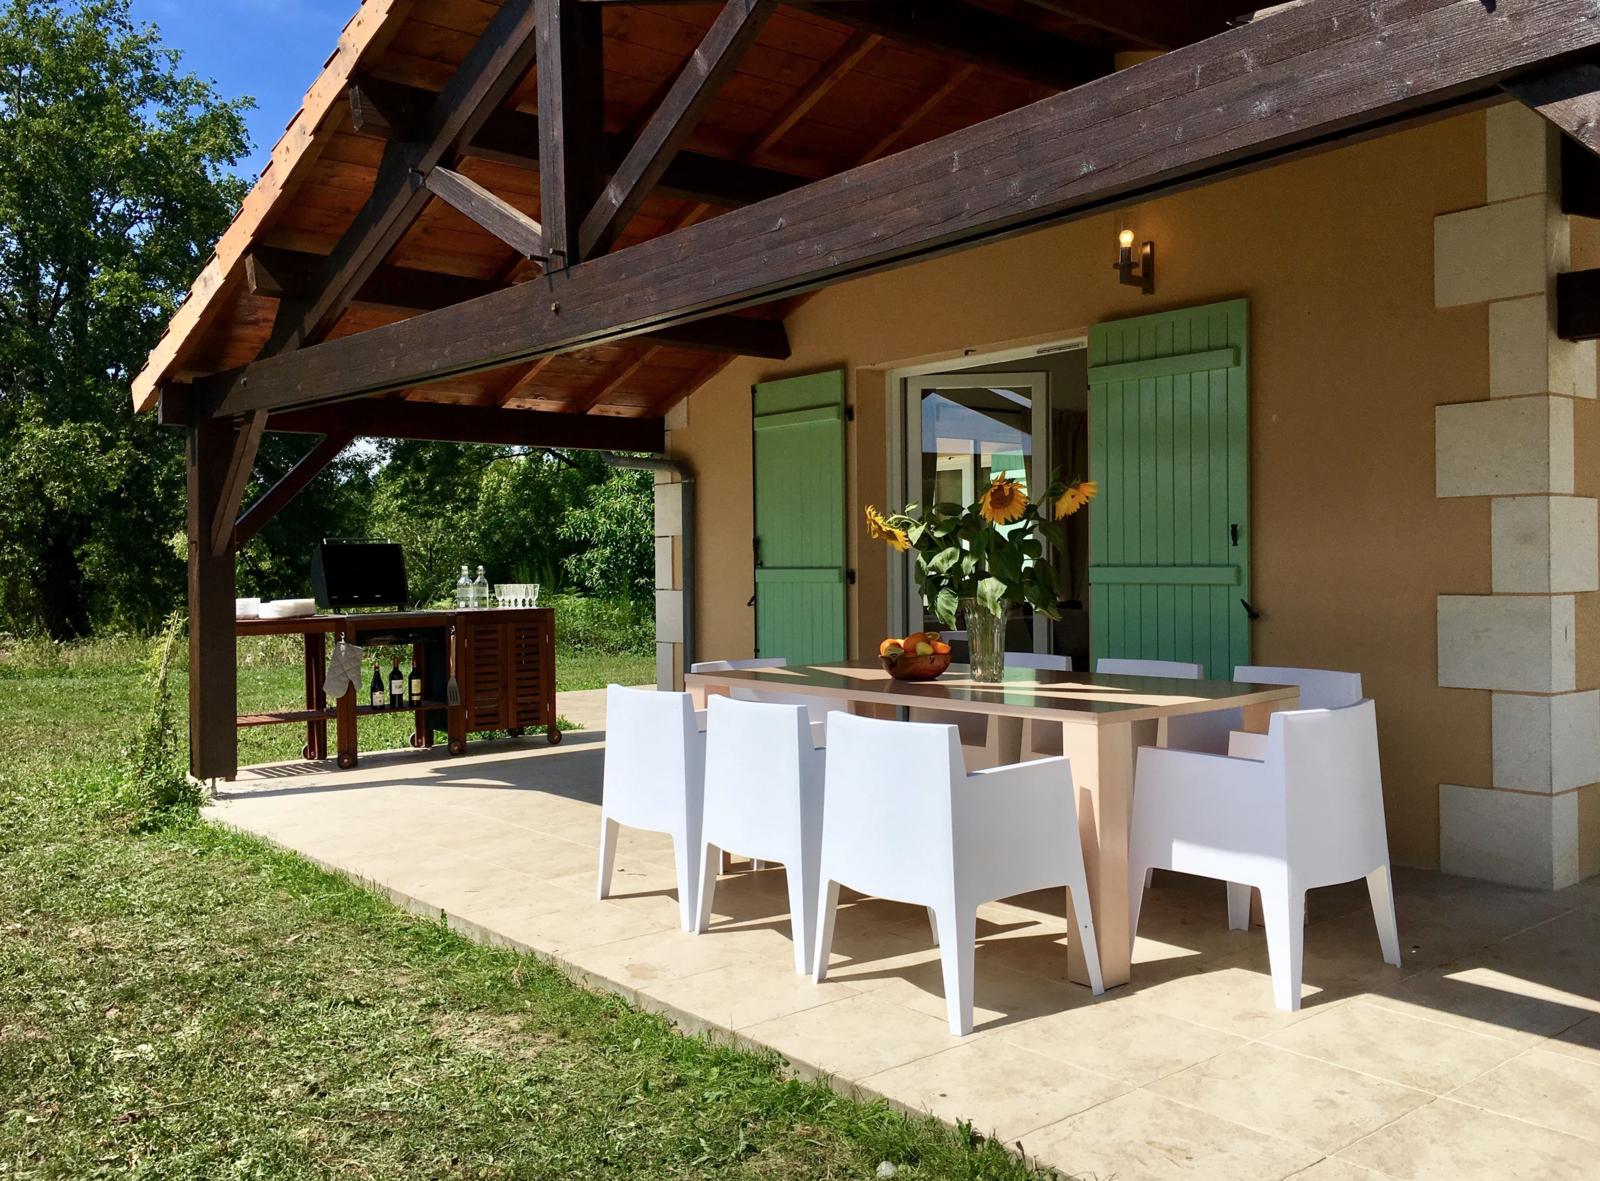 Veranda, terrace with BBQ